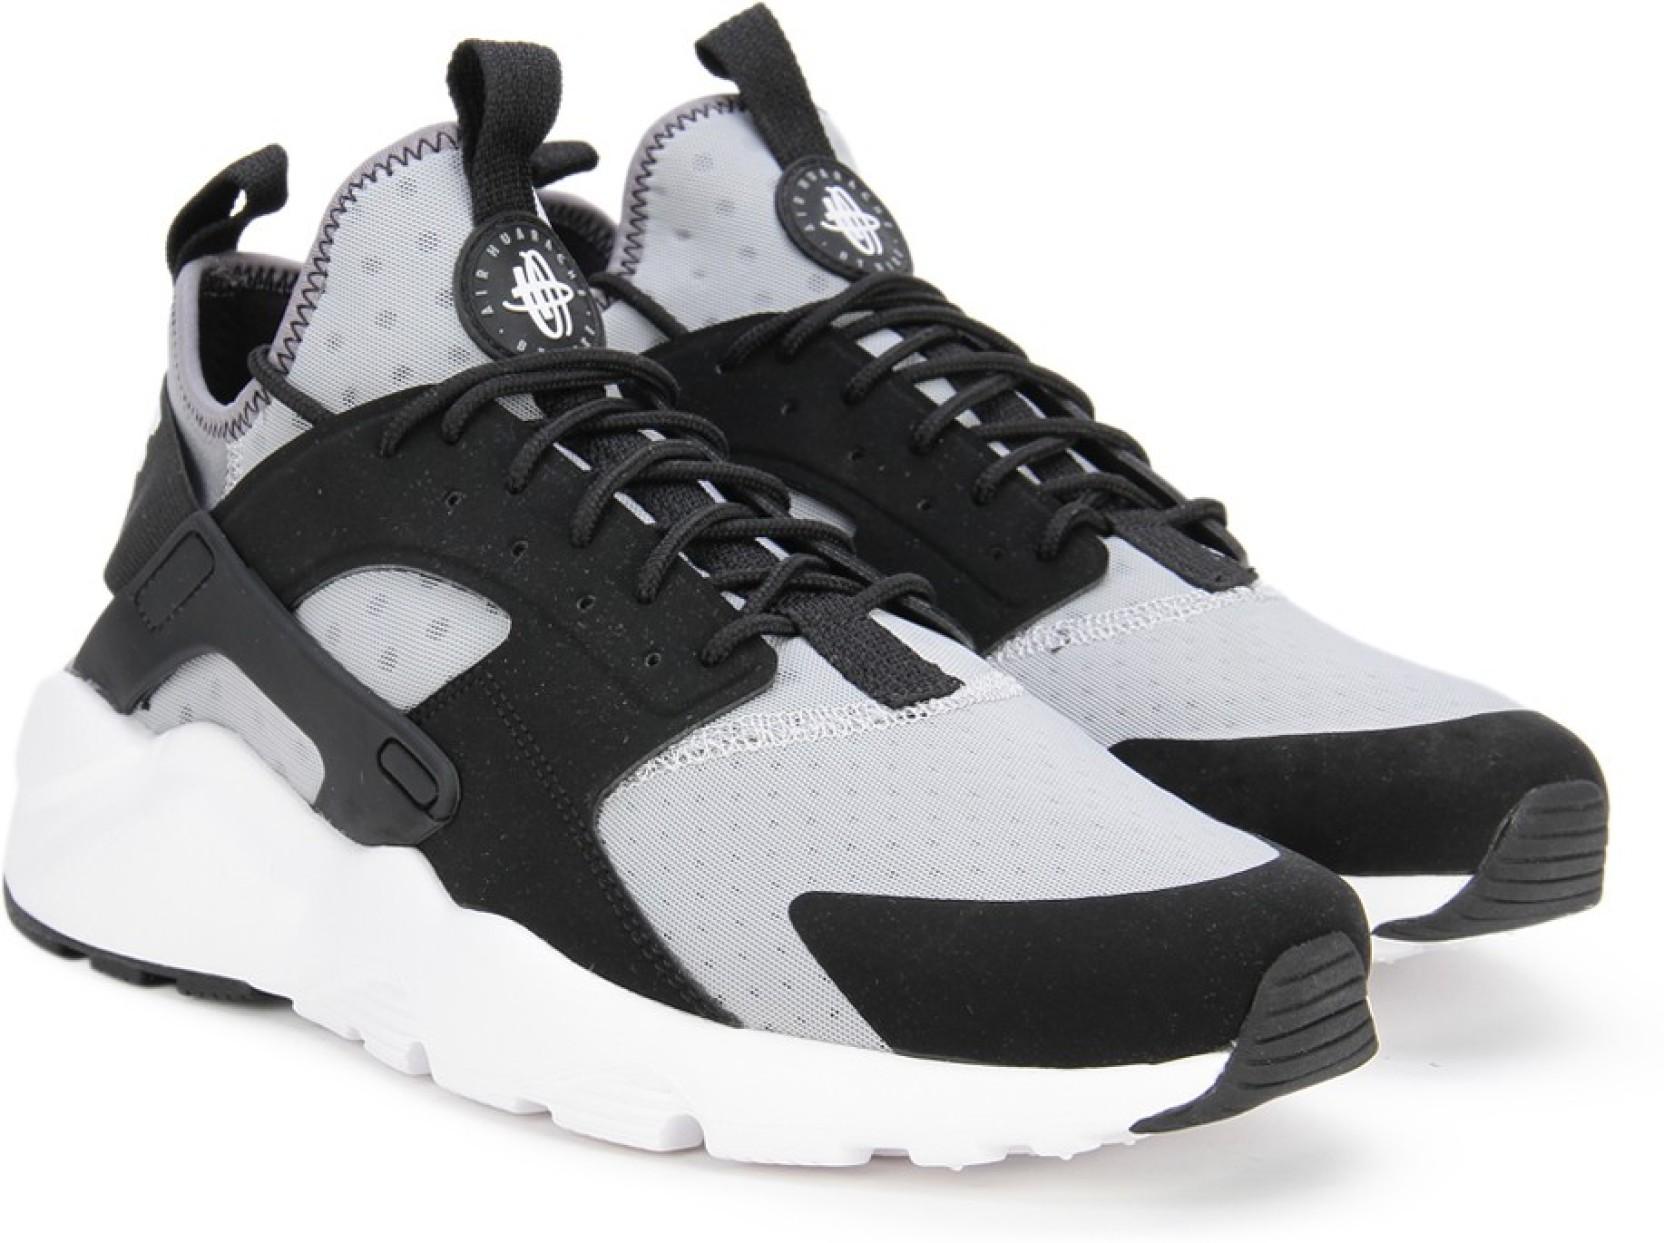 cheap for discount f0f52 43c10 Nike AIR HUARACHE RUN ULTRA Sneakers For Men